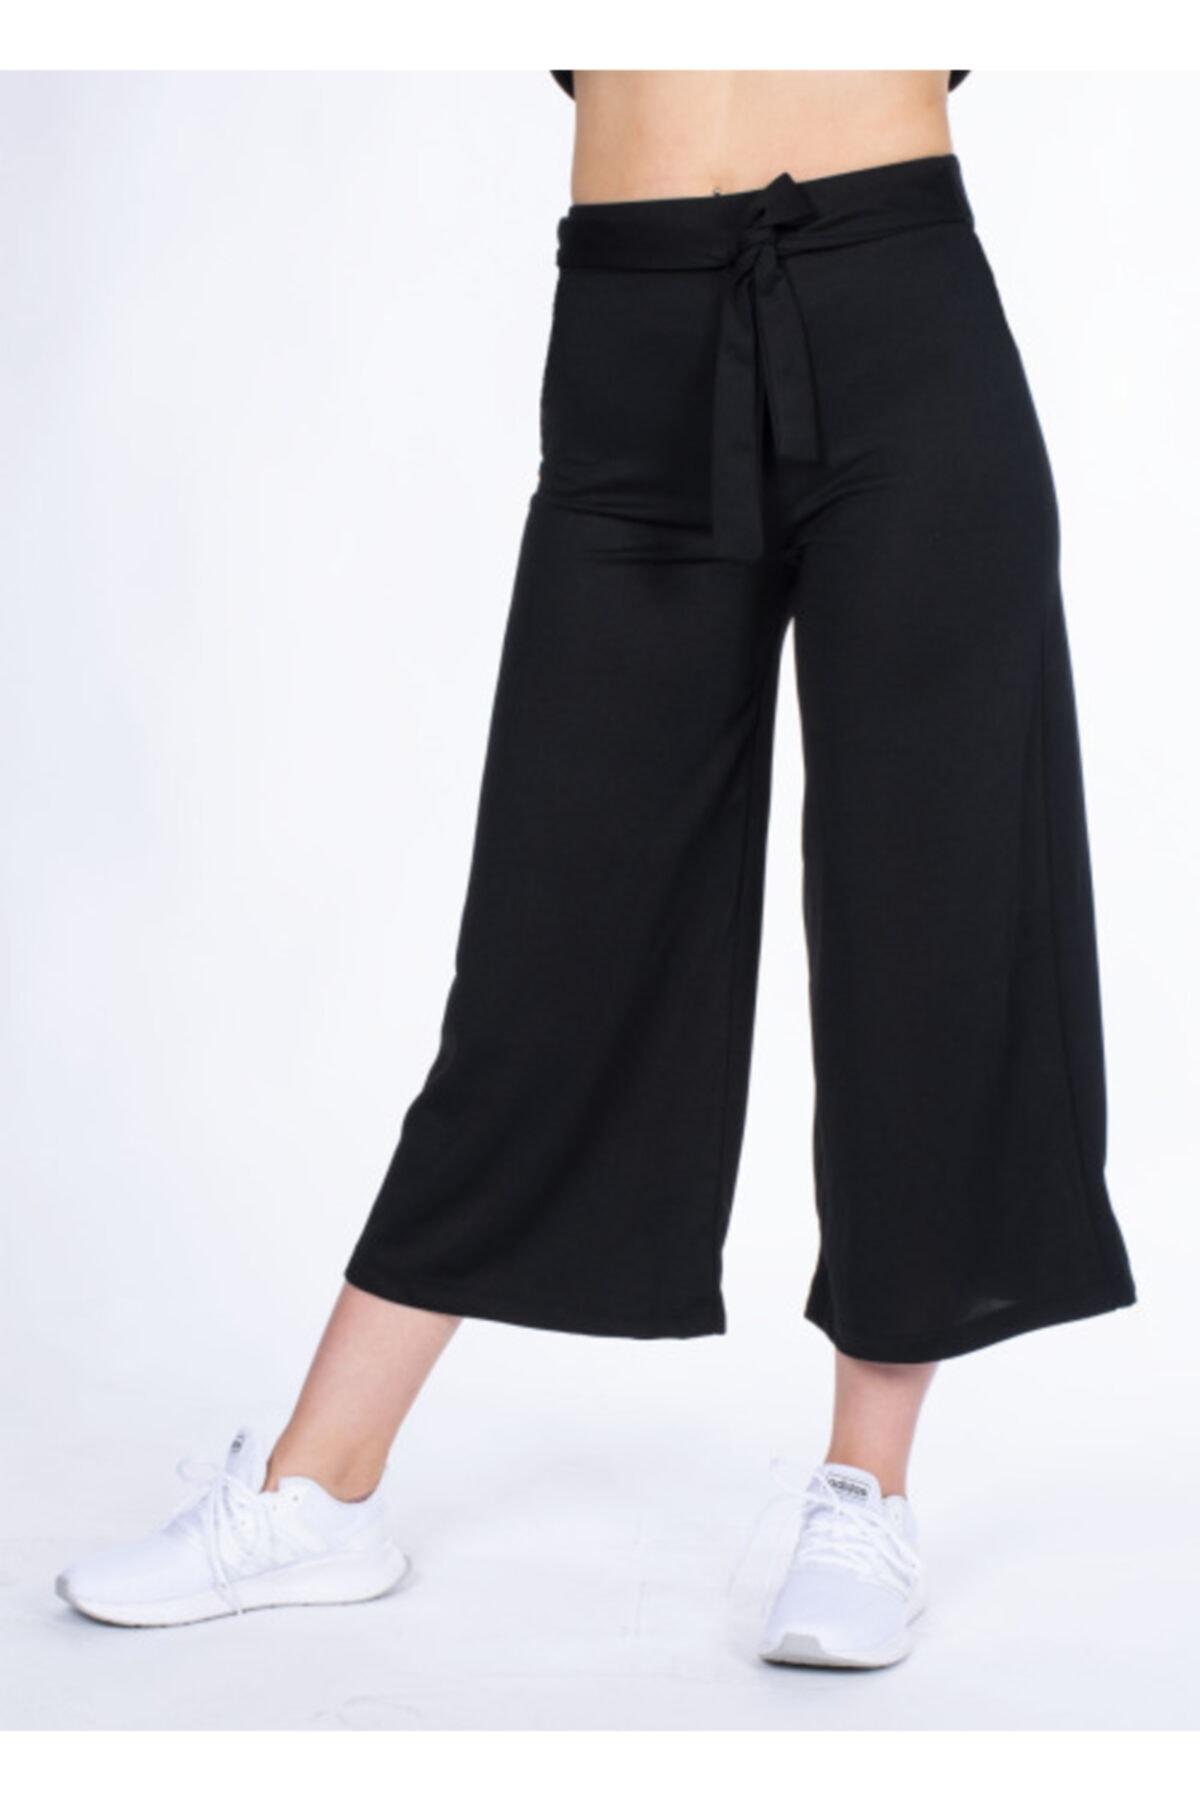 Vision Kadın Siyah Kemer Detaylı Pantolon 2